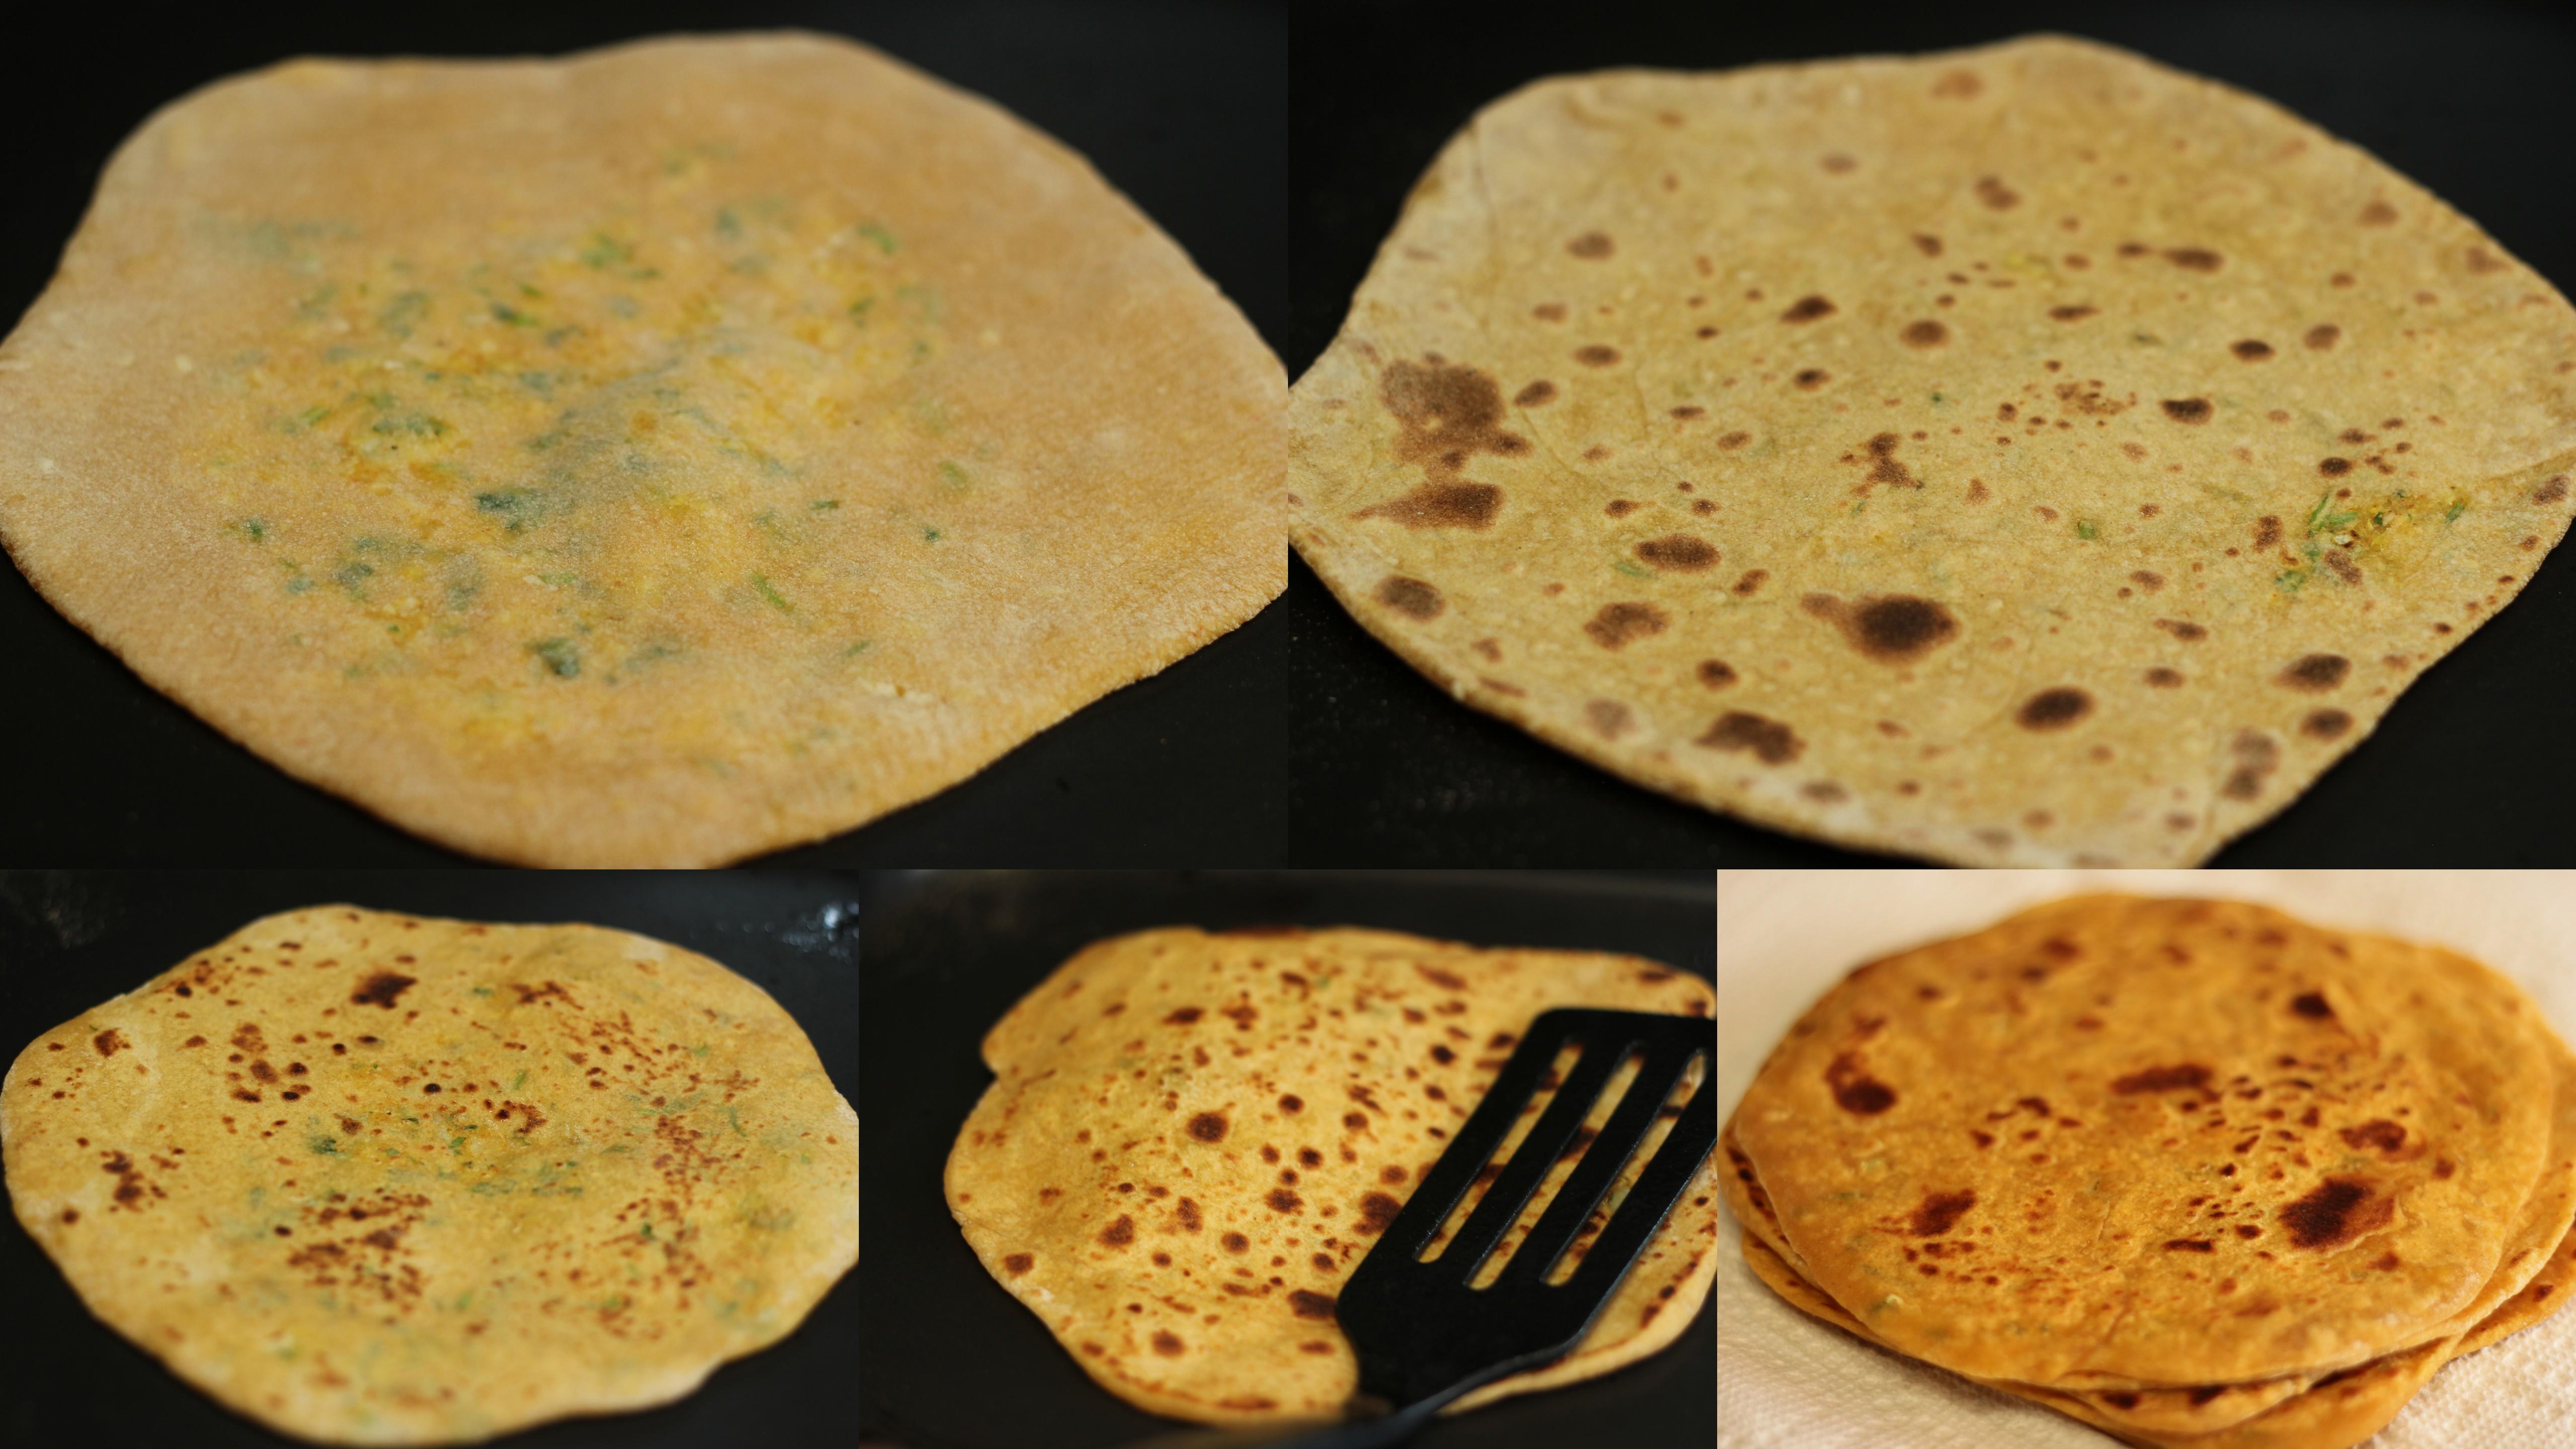 mooli-paratha-step-by-step-recipe-cooking-paratha | Aish Cooks